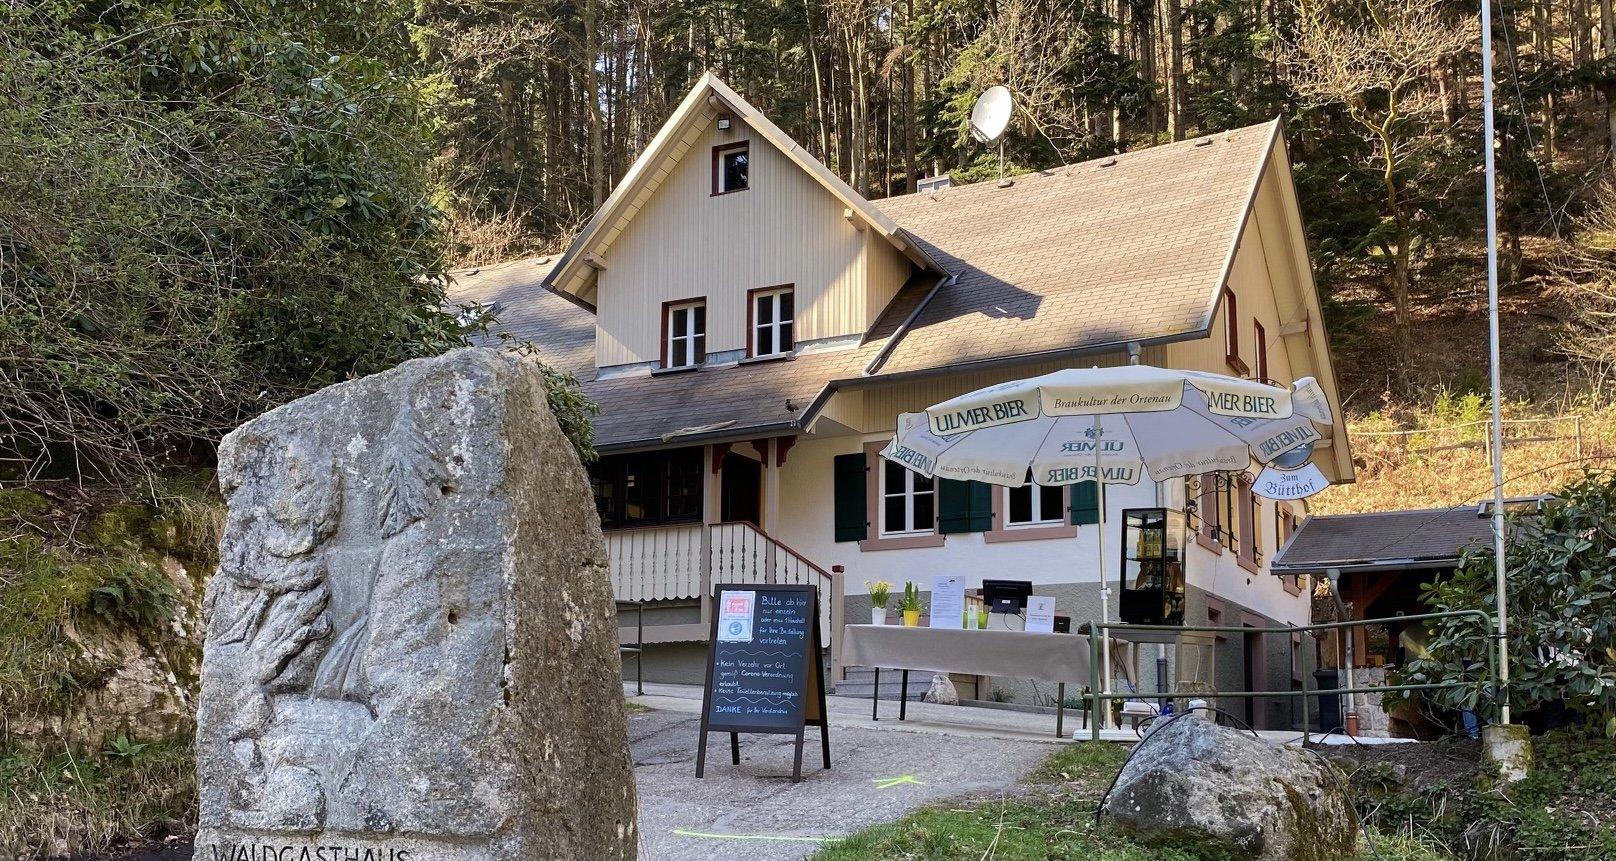 Waldgaststätte Bütthof